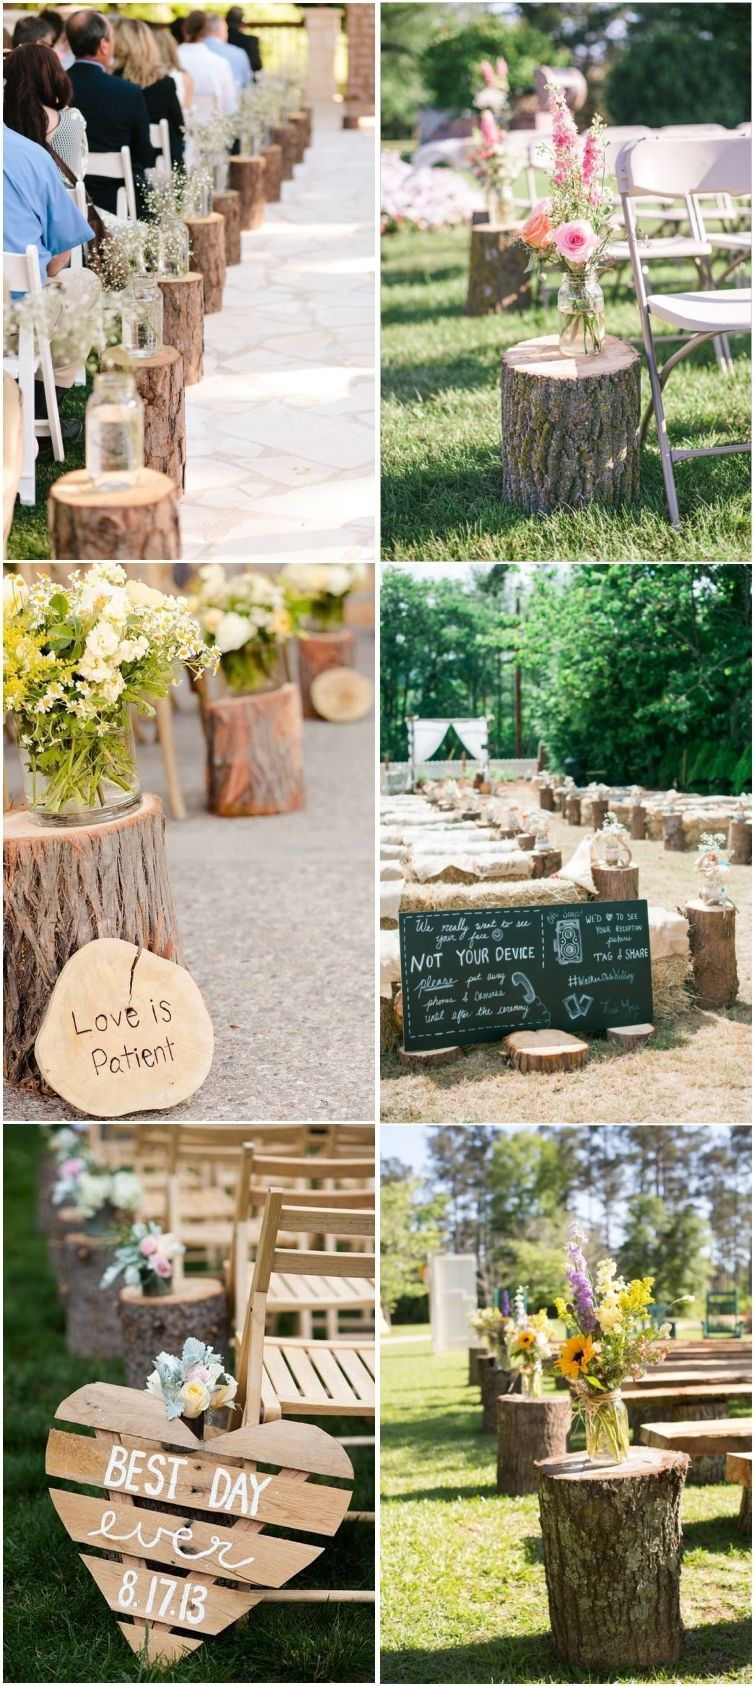 Rustic Woodsy Wedding Trend 2020 Tree Stump Wedding Aisle